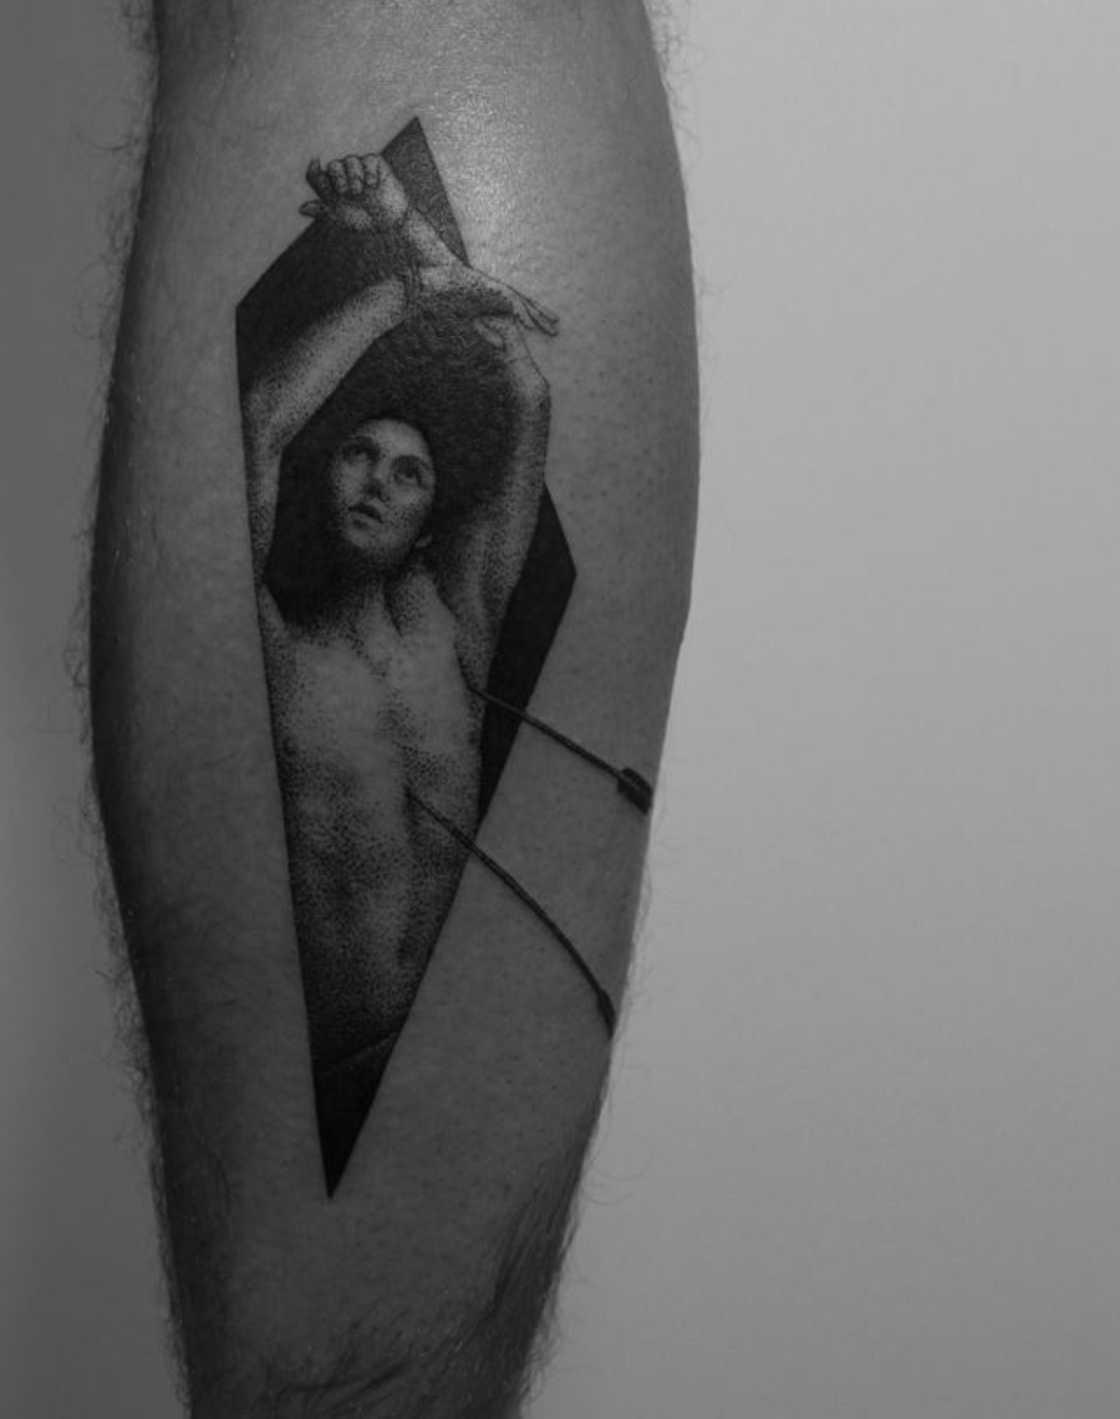 dotyk-dotwork-tattoo-9